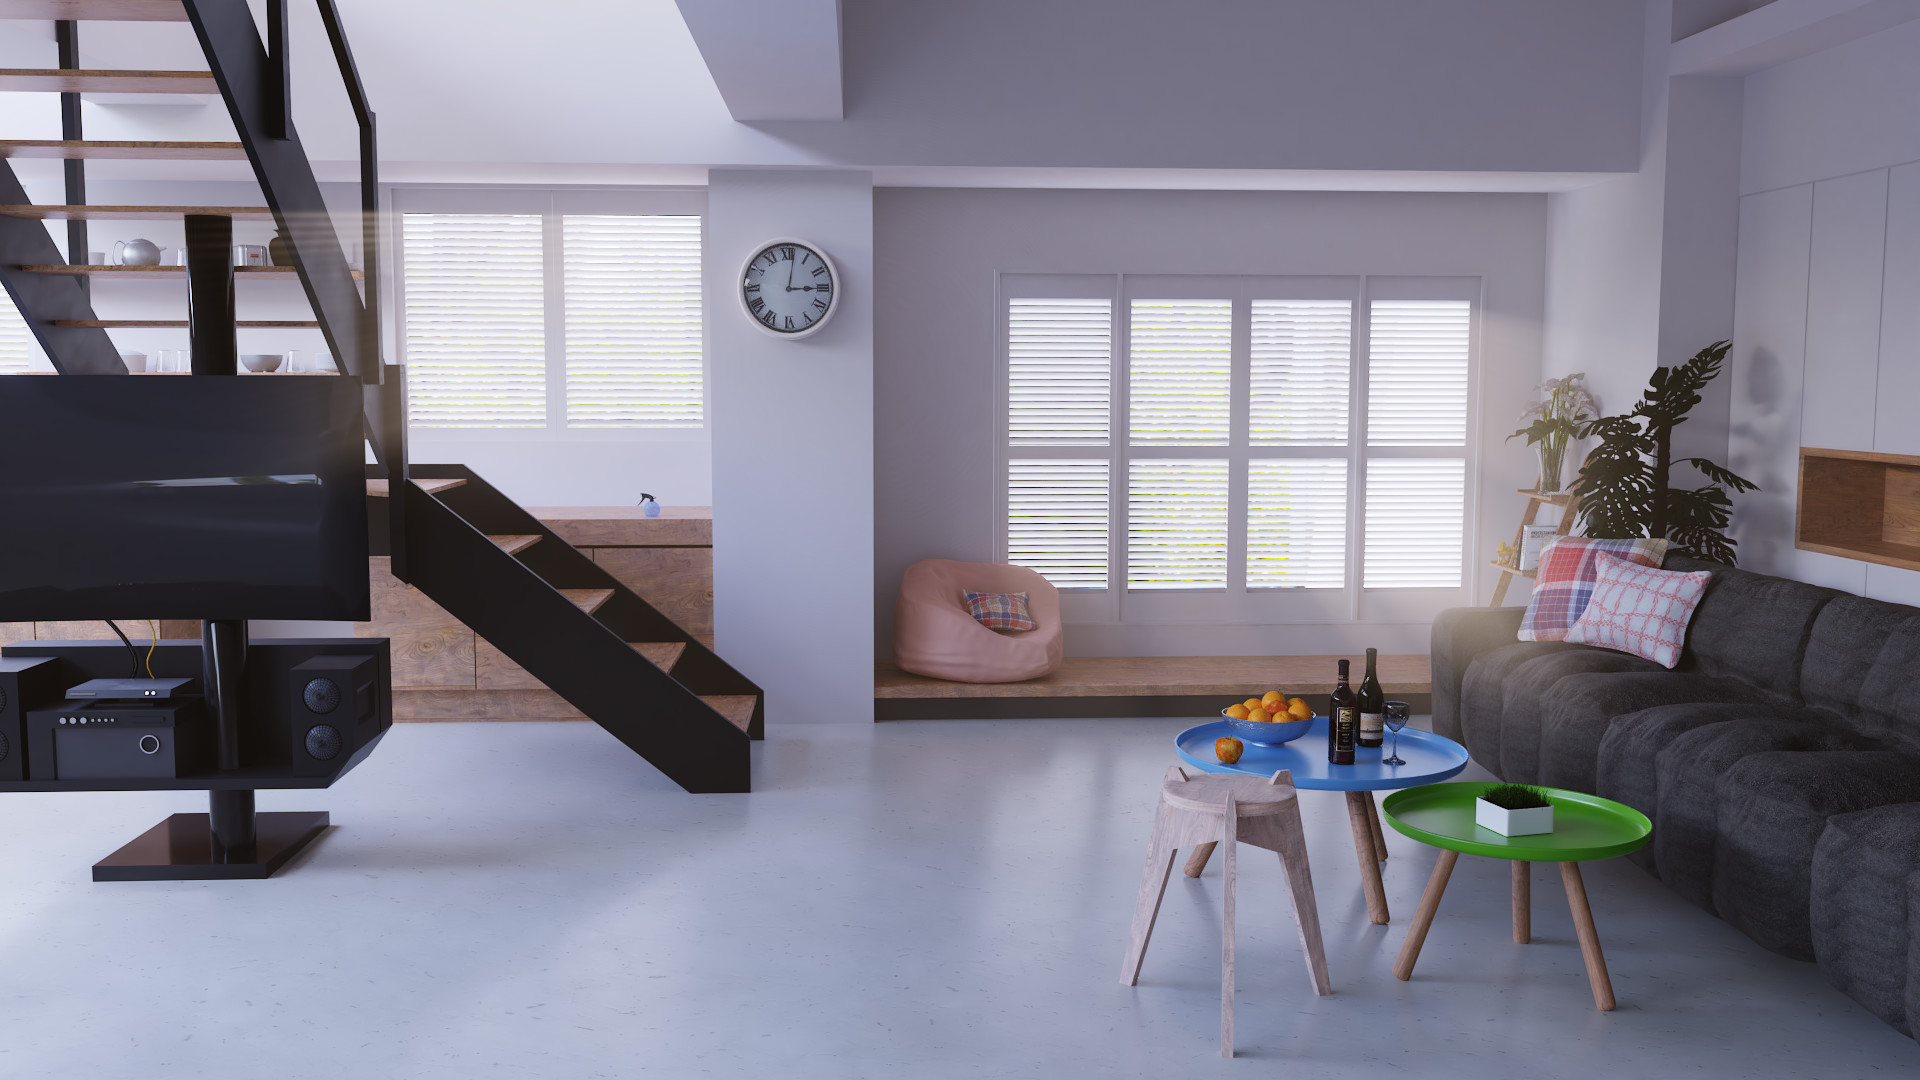 Arpx palinkas living room1 render